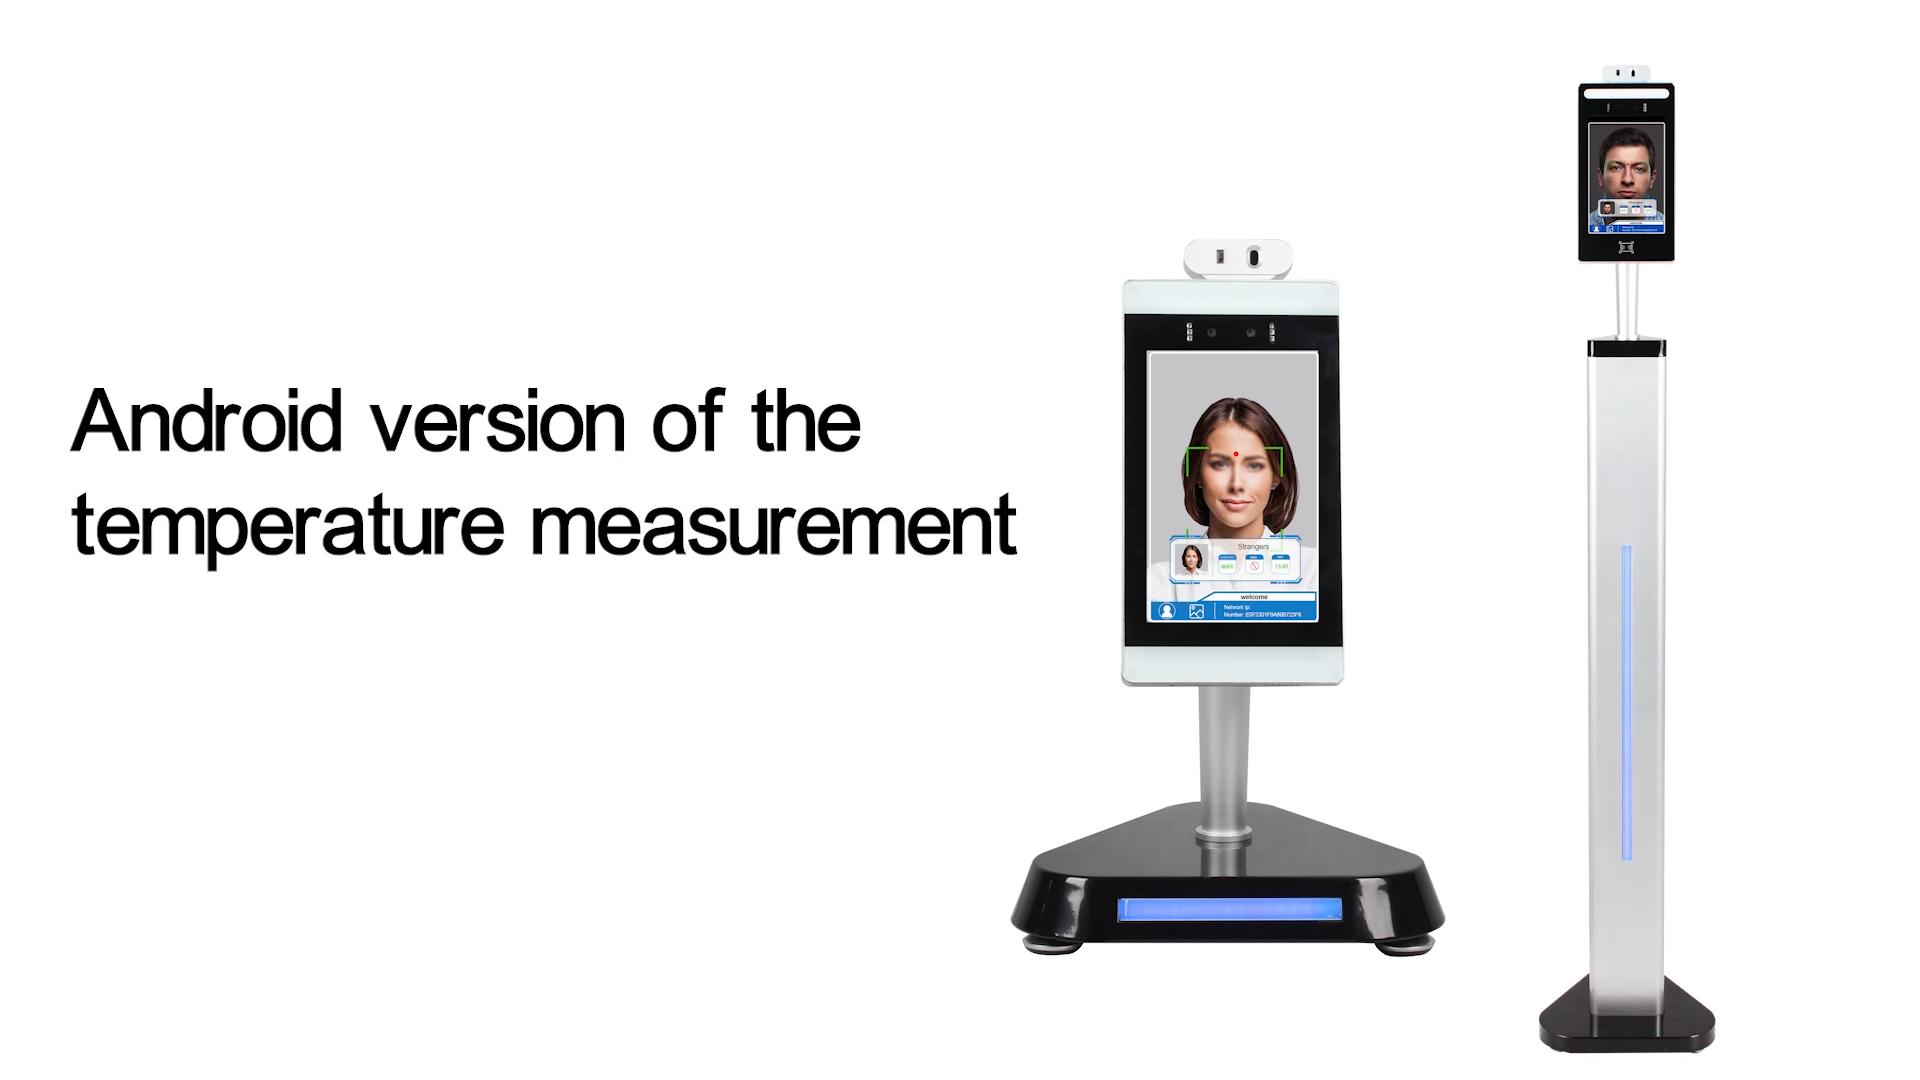 Niet Contact Body Temperatuur Scanner 8 Inch Lcd Thermometer Gezichtsherkenning Camera Systeem